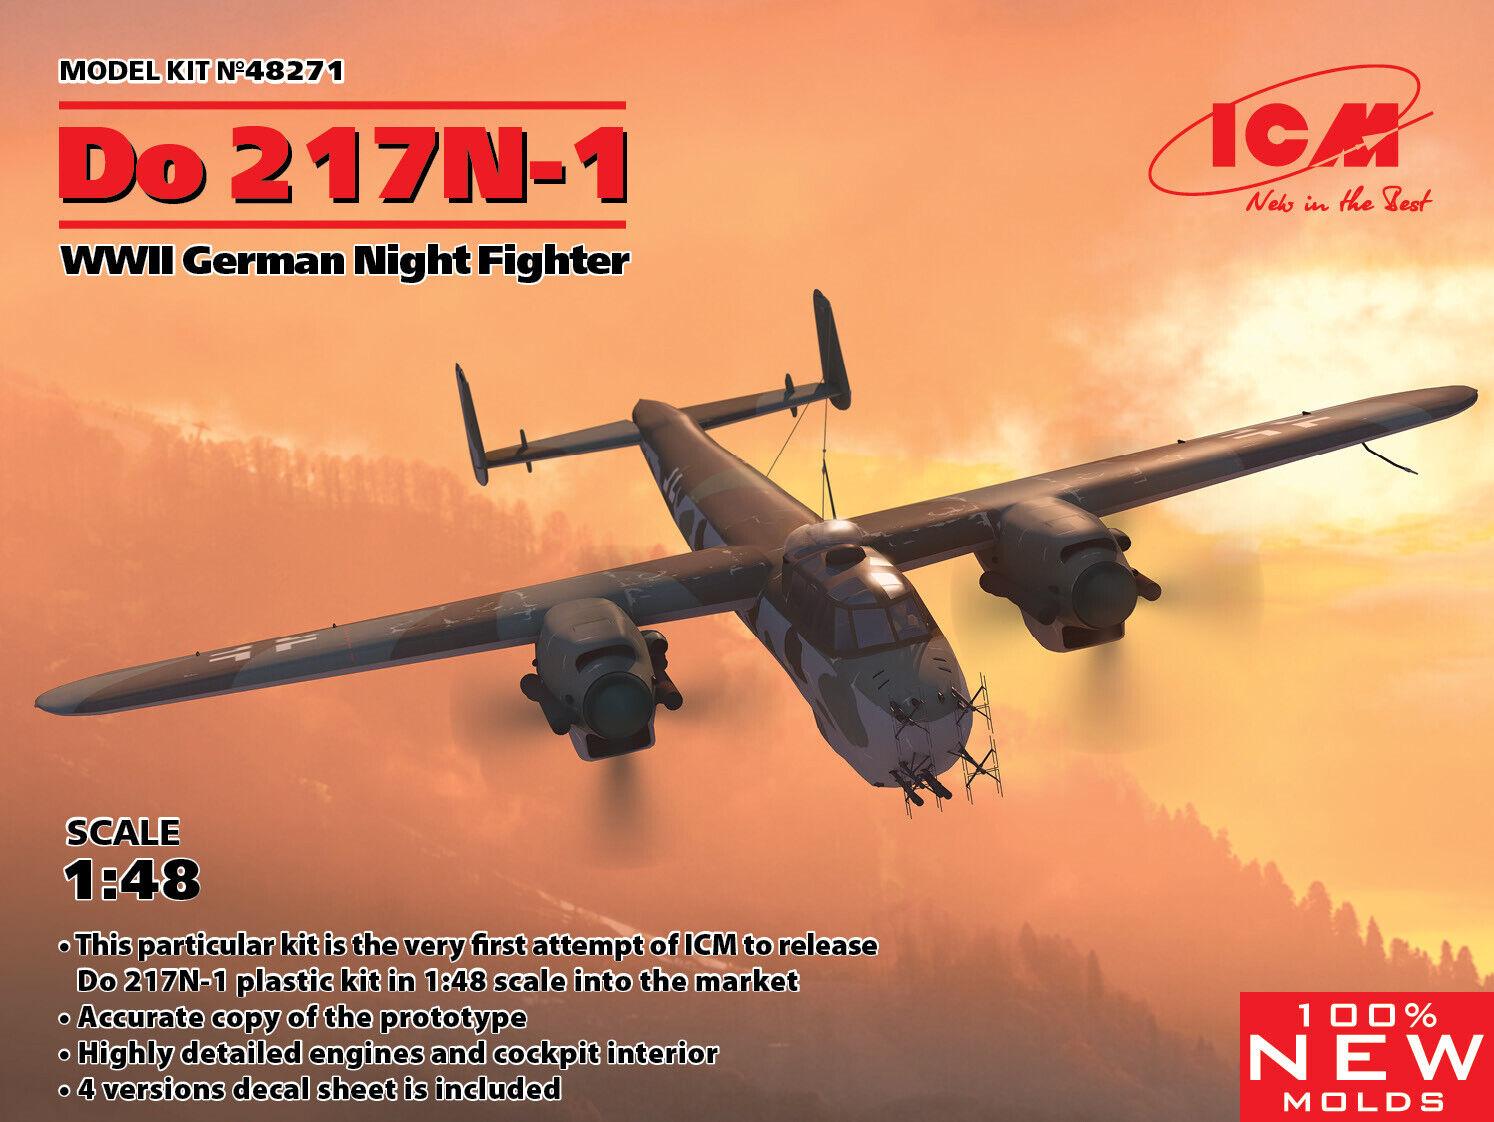 nueva gama alta exclusiva Icm 1 48 Dornier Do-217N-1 Seconda Guerra Mondiale Mondiale Mondiale Tedesco Night Fighter  48271  100% precio garantizado